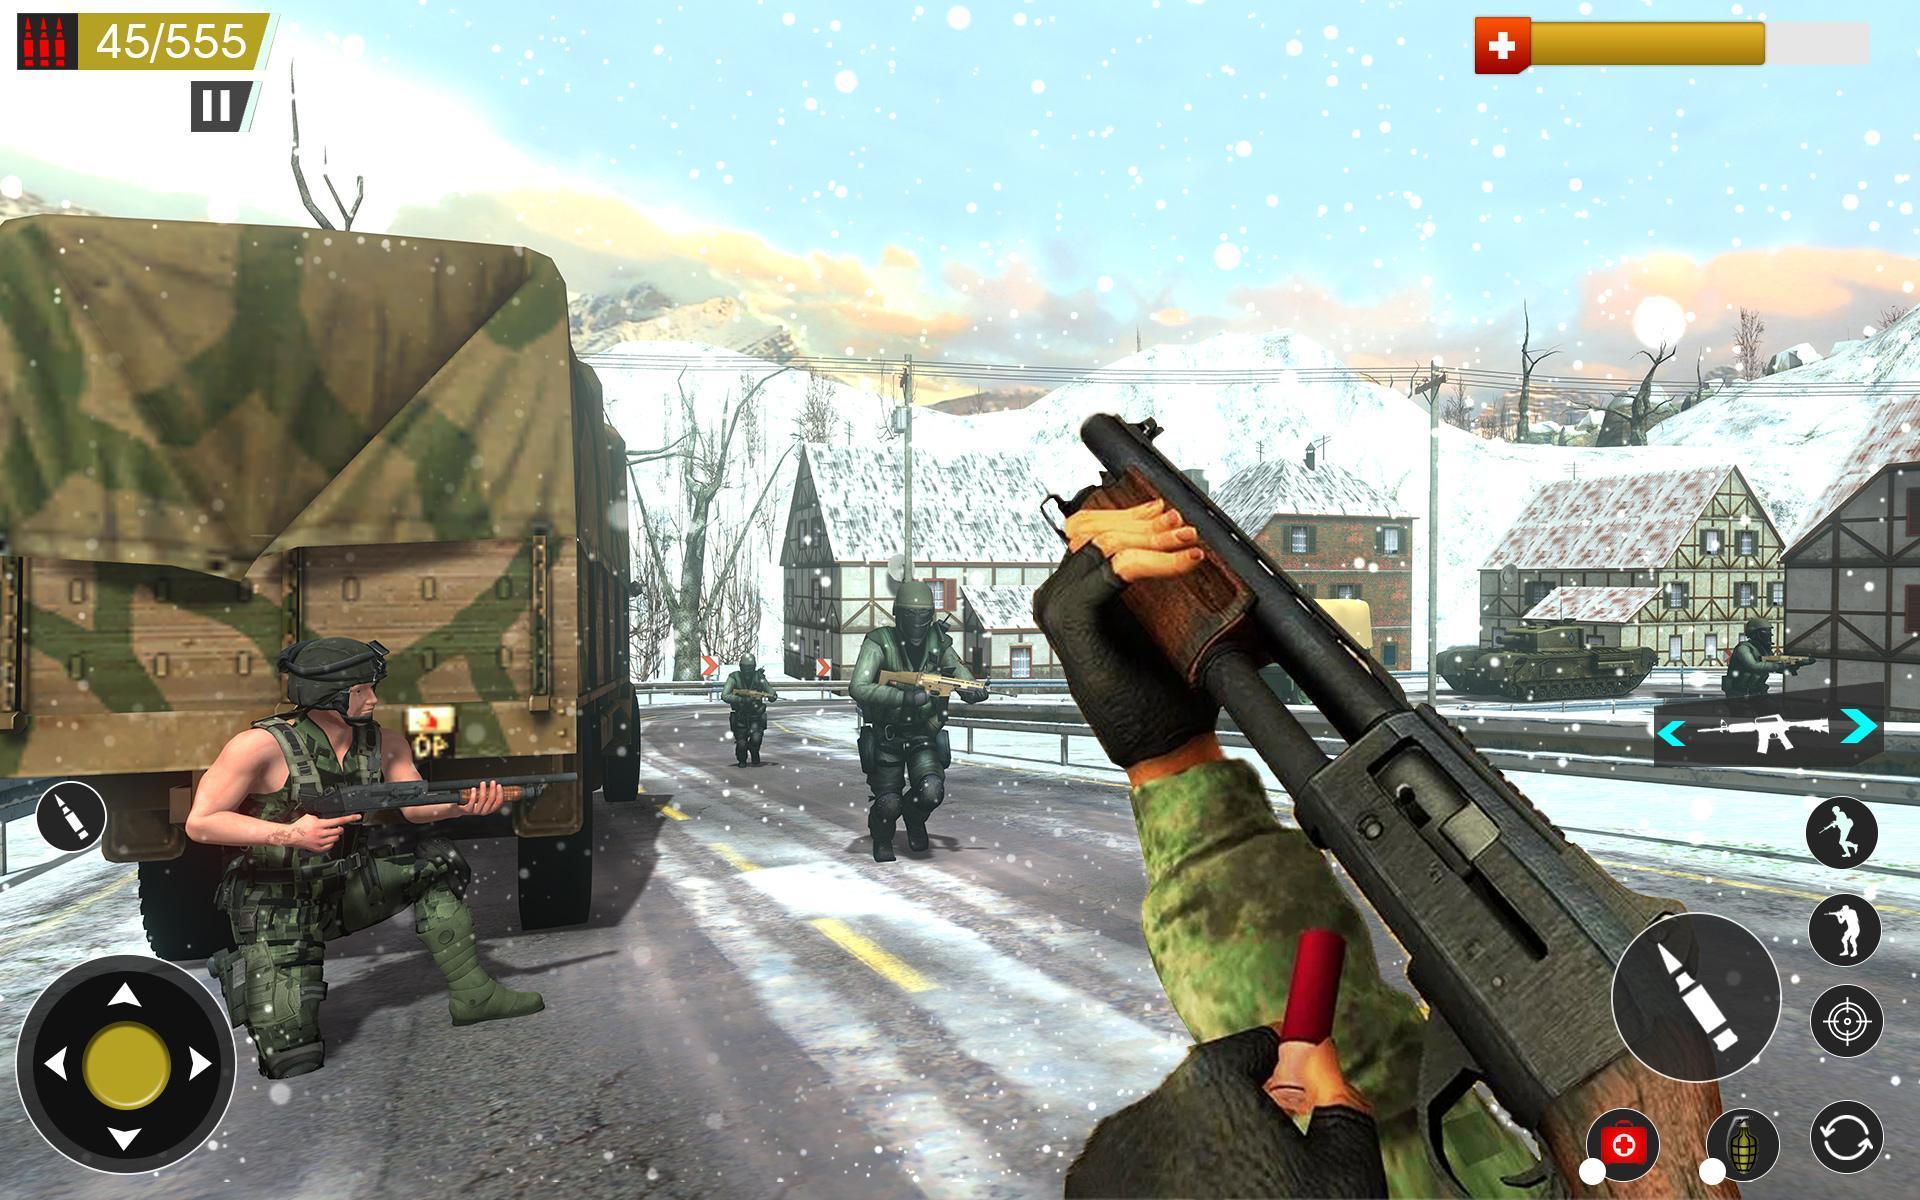 American World War Fps Shooter Free Shooting Games 4.8 Screenshot 10